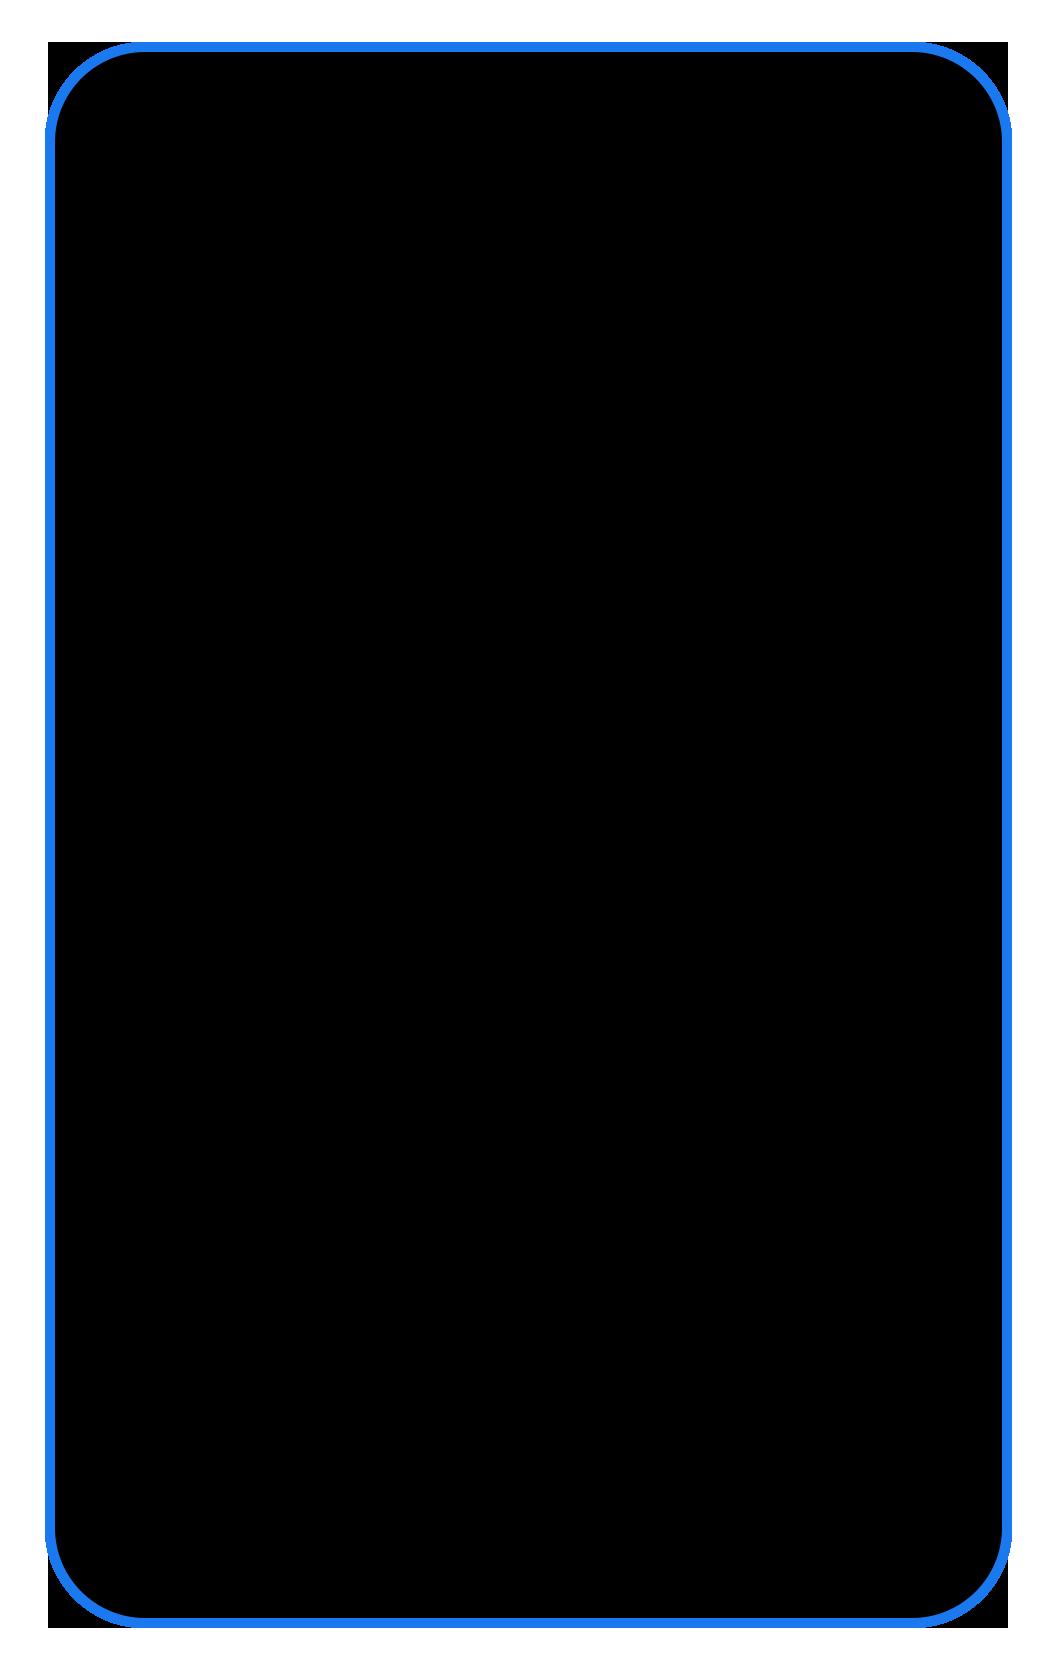 Clipart door rectangular object. How ai powers your